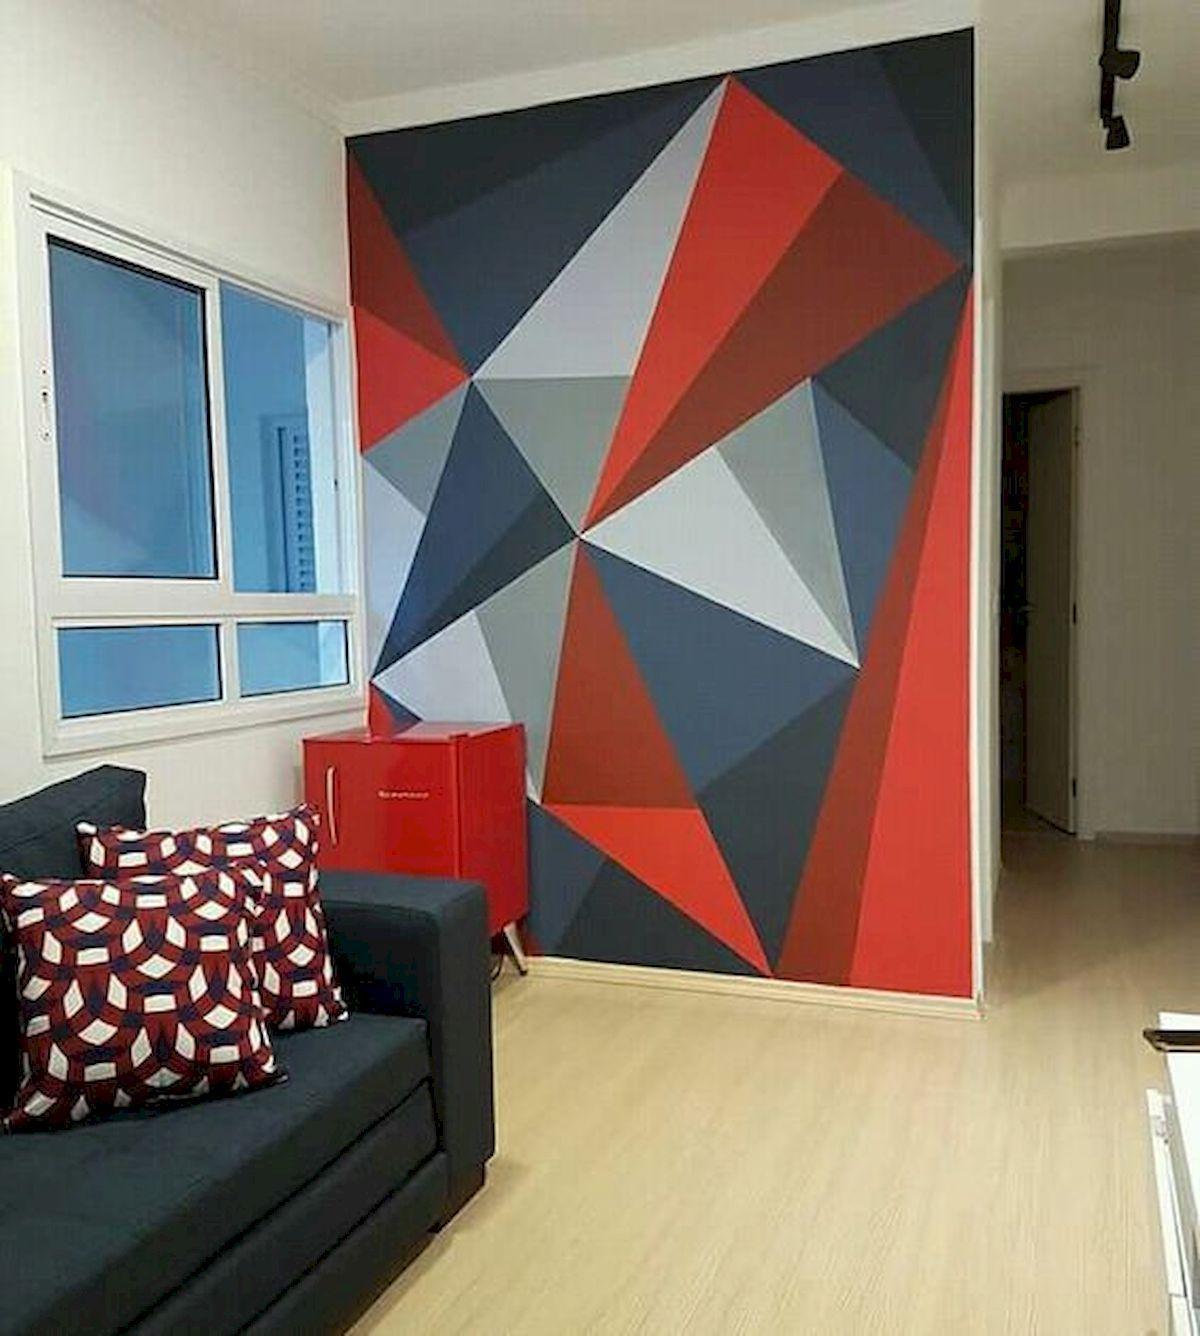 60 Best Geometric Wall Art Paint Design Ideas 9 33decor Wall Paint Designs Geometric Wall Art Diy Wall Painting